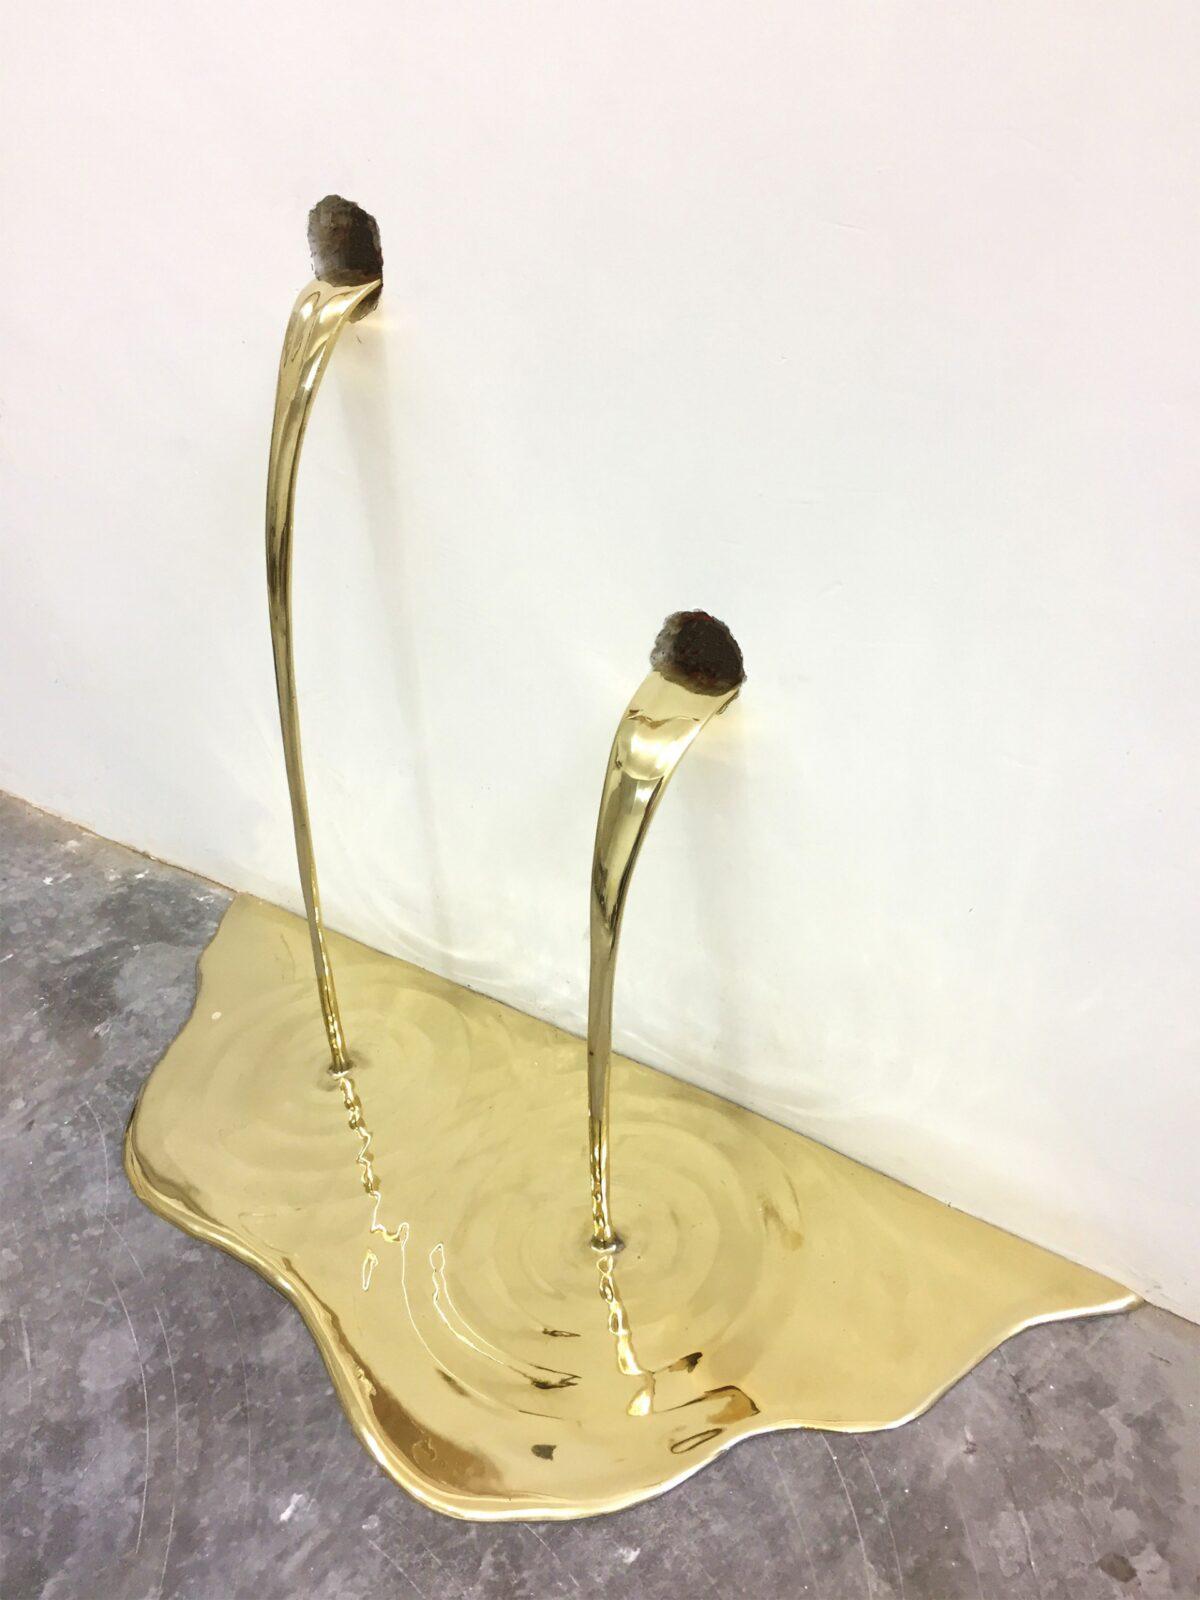 Vanderlei Lopes And His Incredible Sculptures